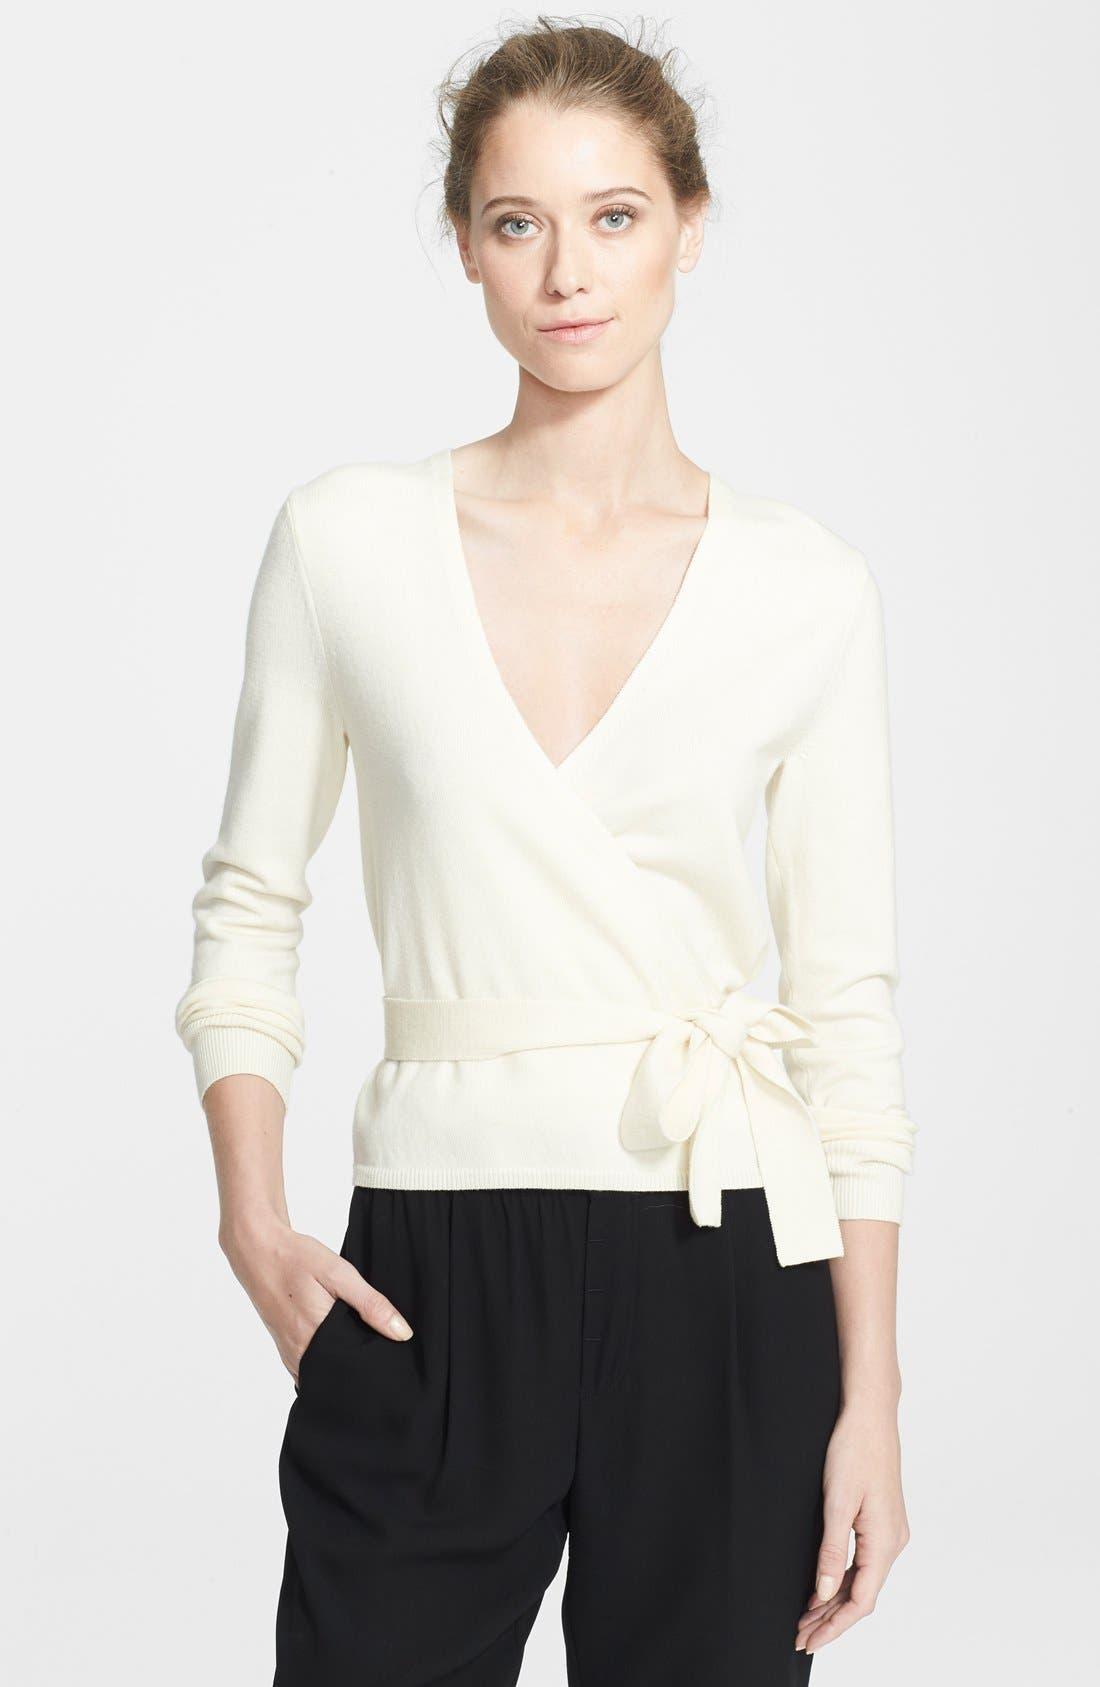 Alternate Image 1 Selected - Diane von Furstenberg 'Ballerina' Cardigan Sweater